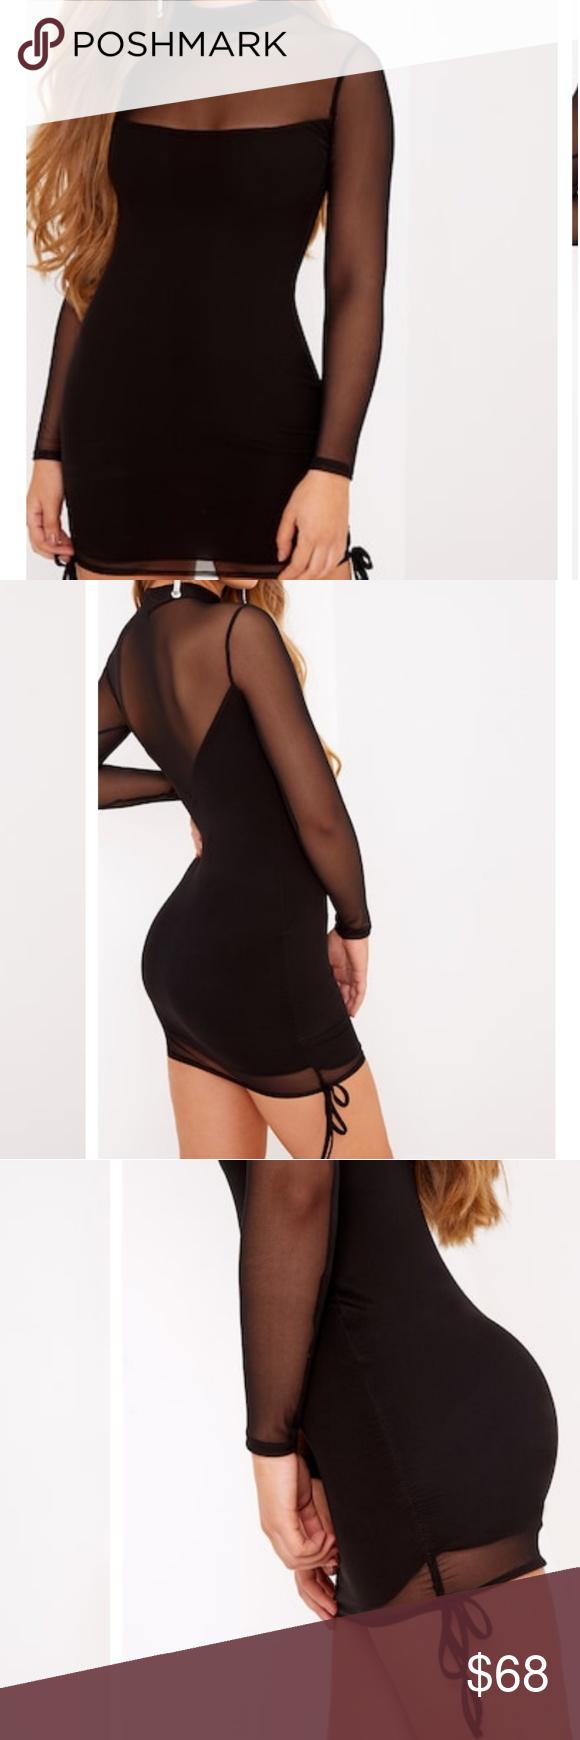 Plt black mesh mini dress black mesh mini dresses and neckline